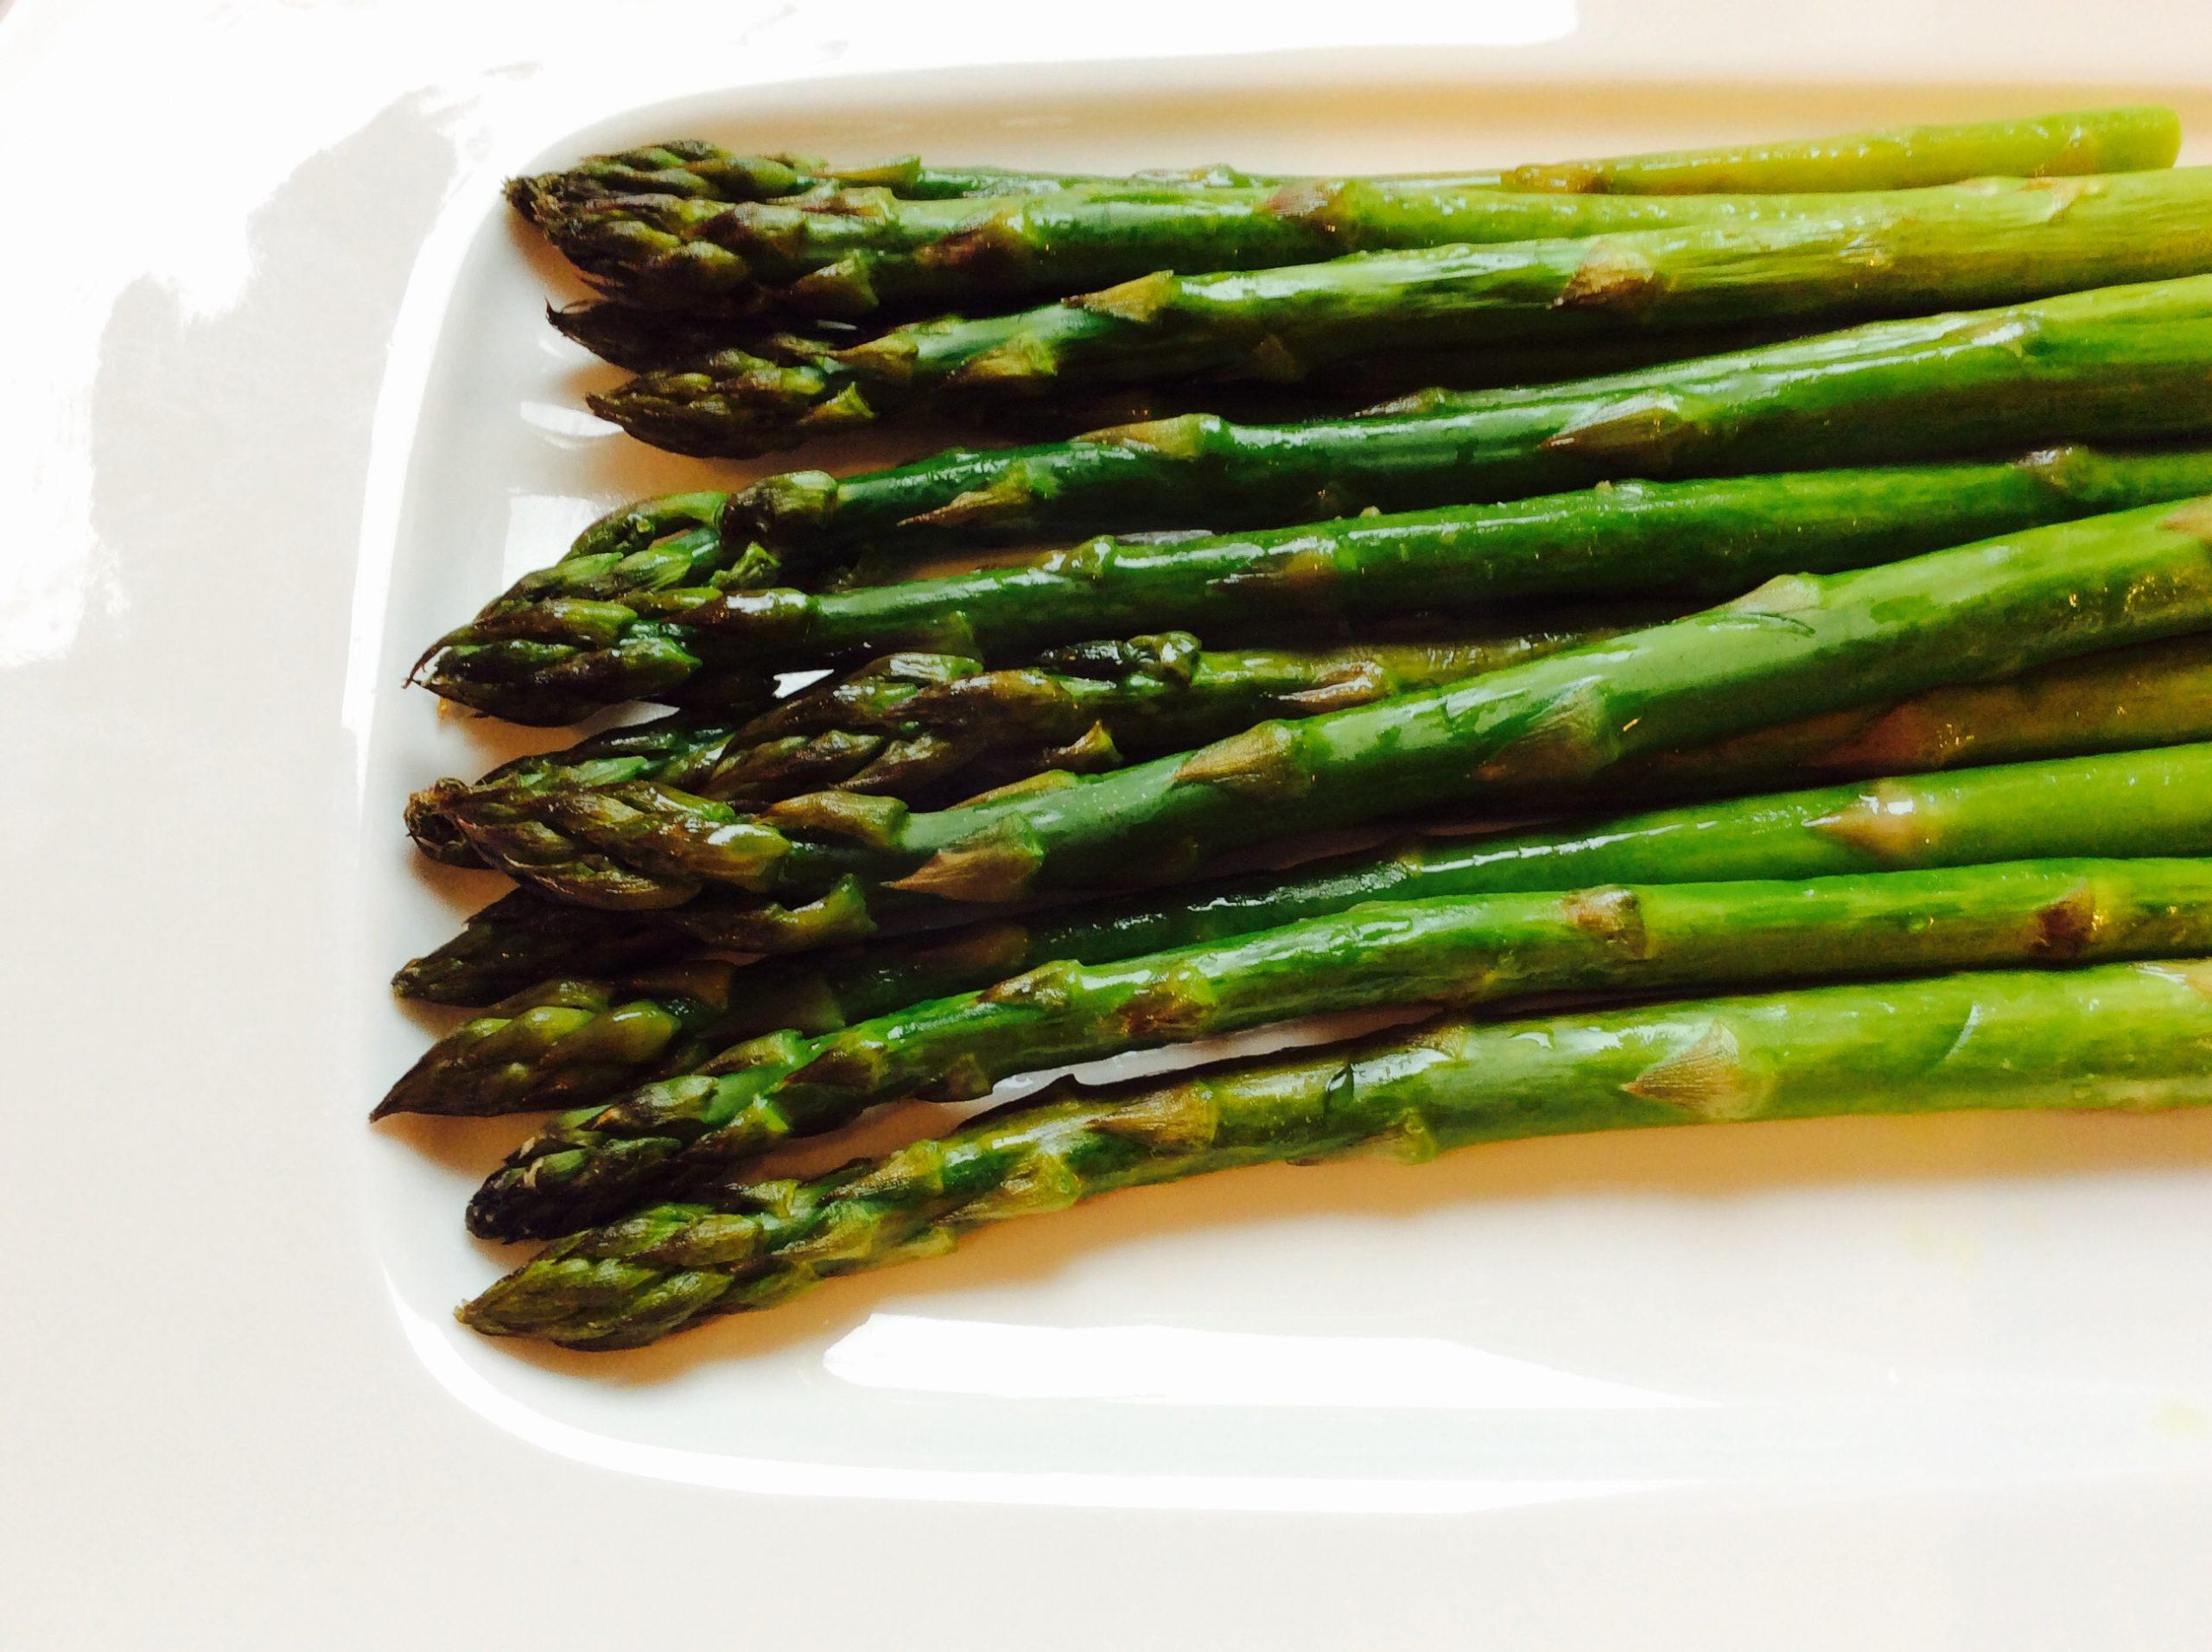 #accompagnement #asperges #asperge #recette #recetteaccompagnement #vegan #vegetarian #végétarien #aspergesaufour